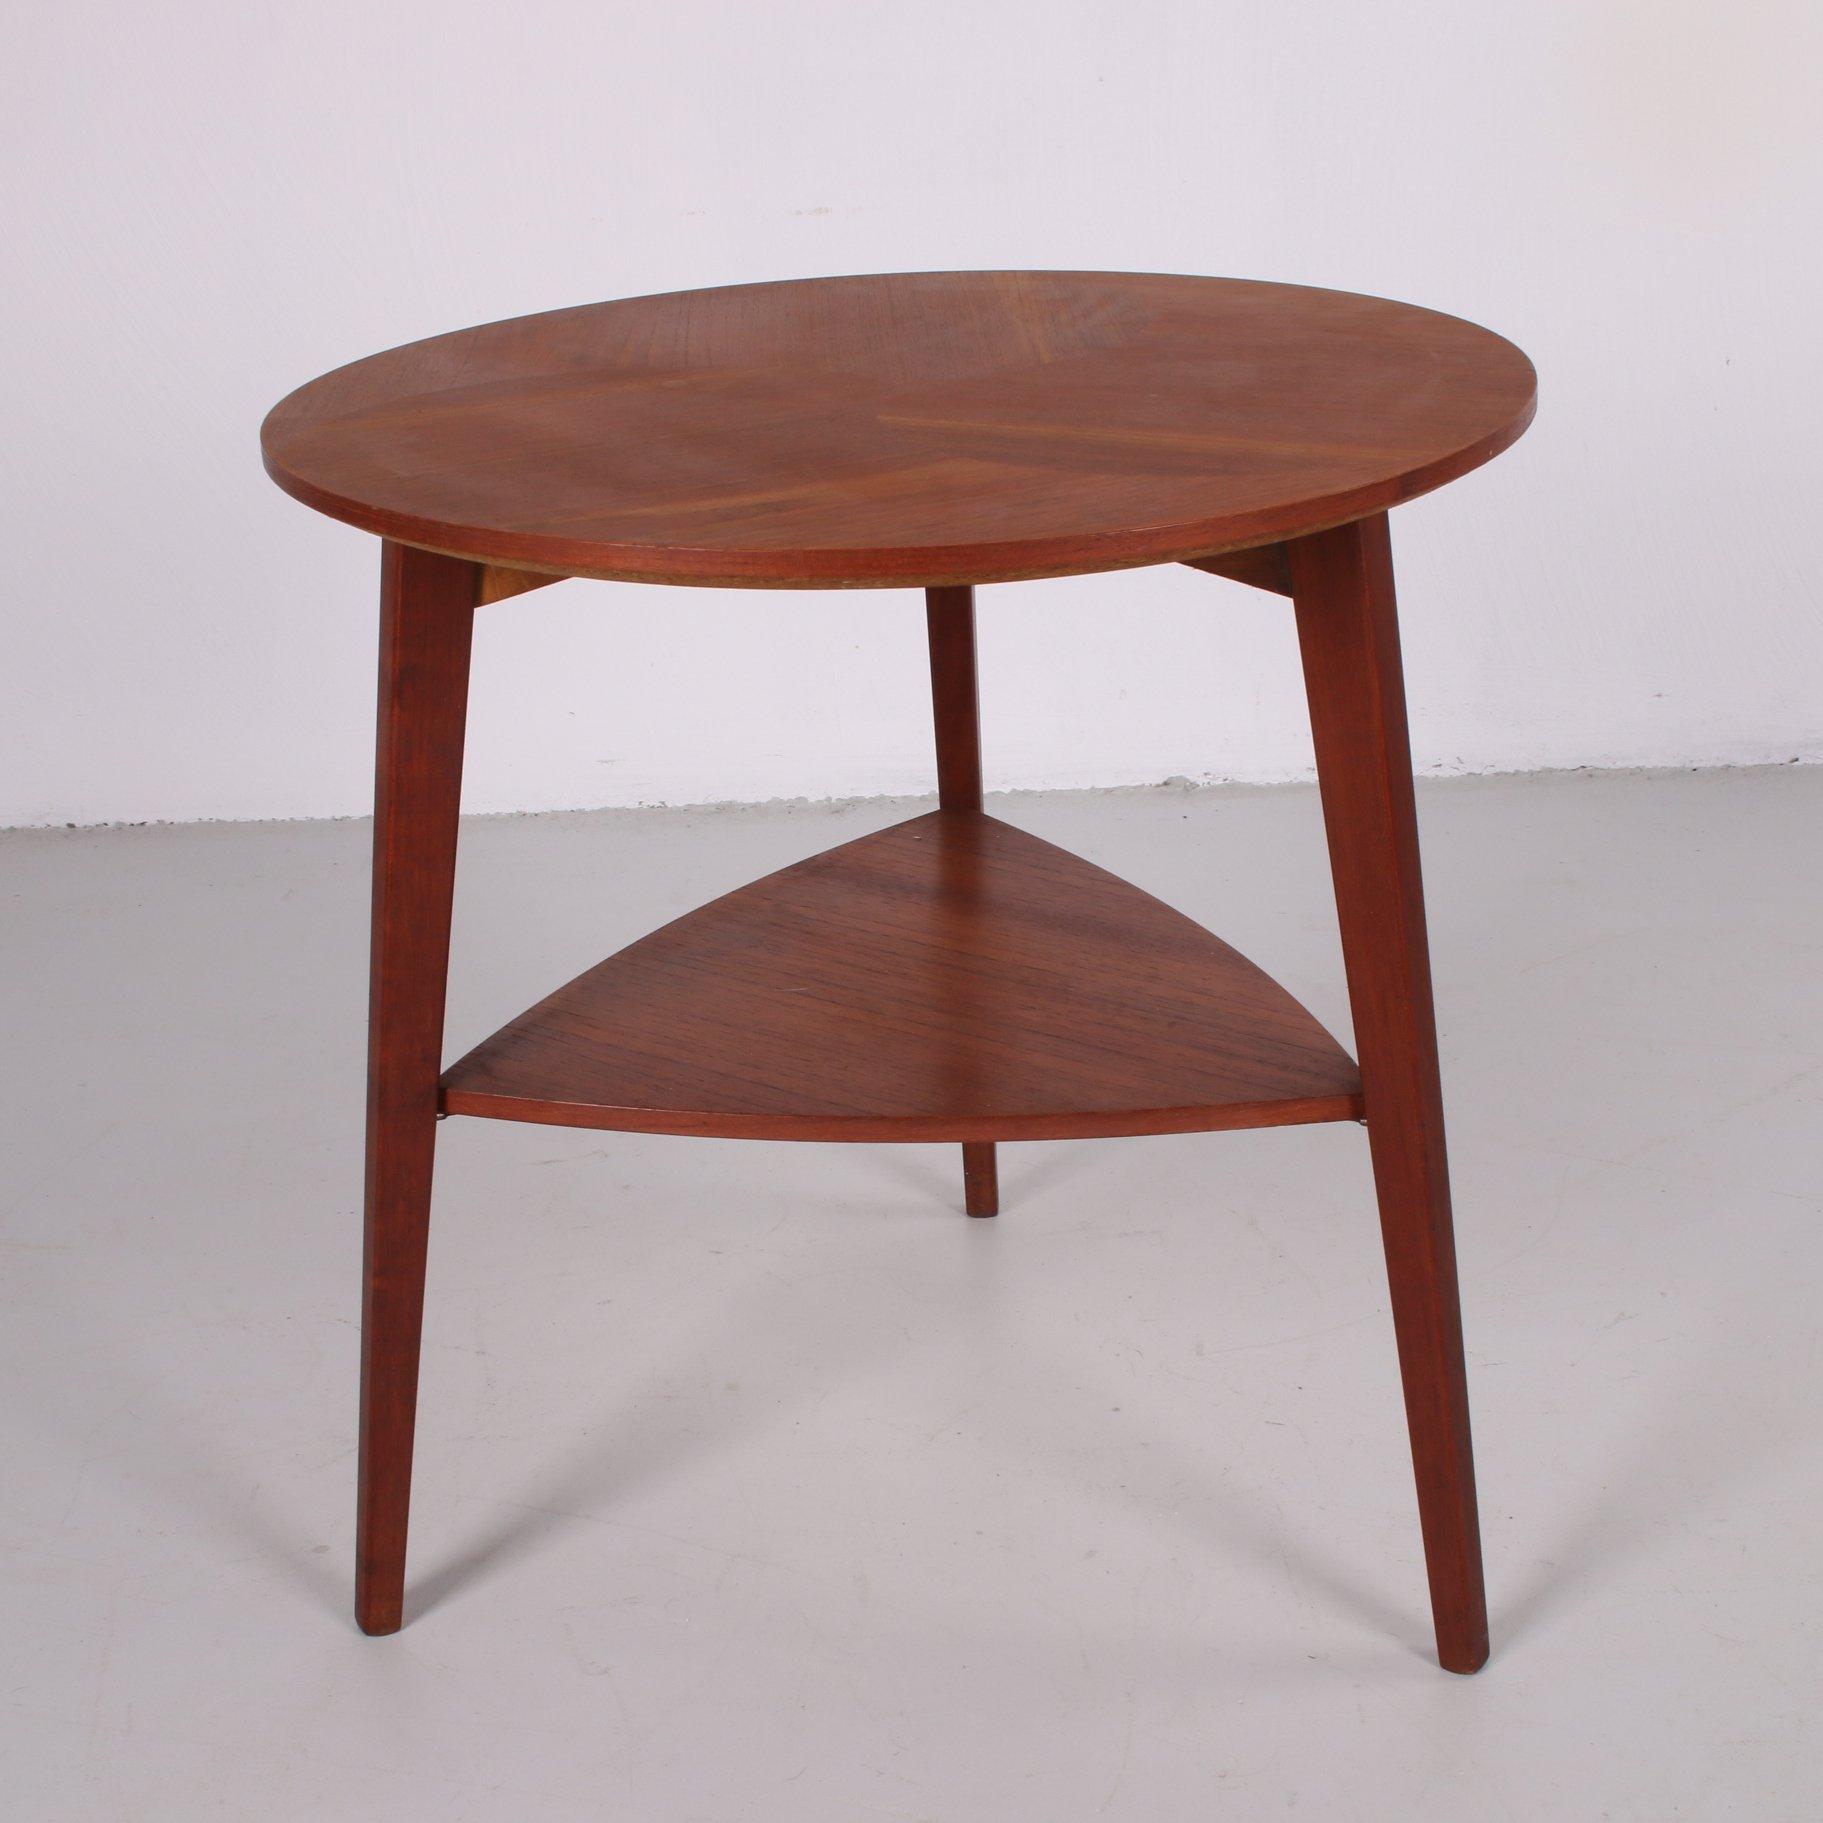 midcentury teak end table by holger georg jensen for kubus circa 1960